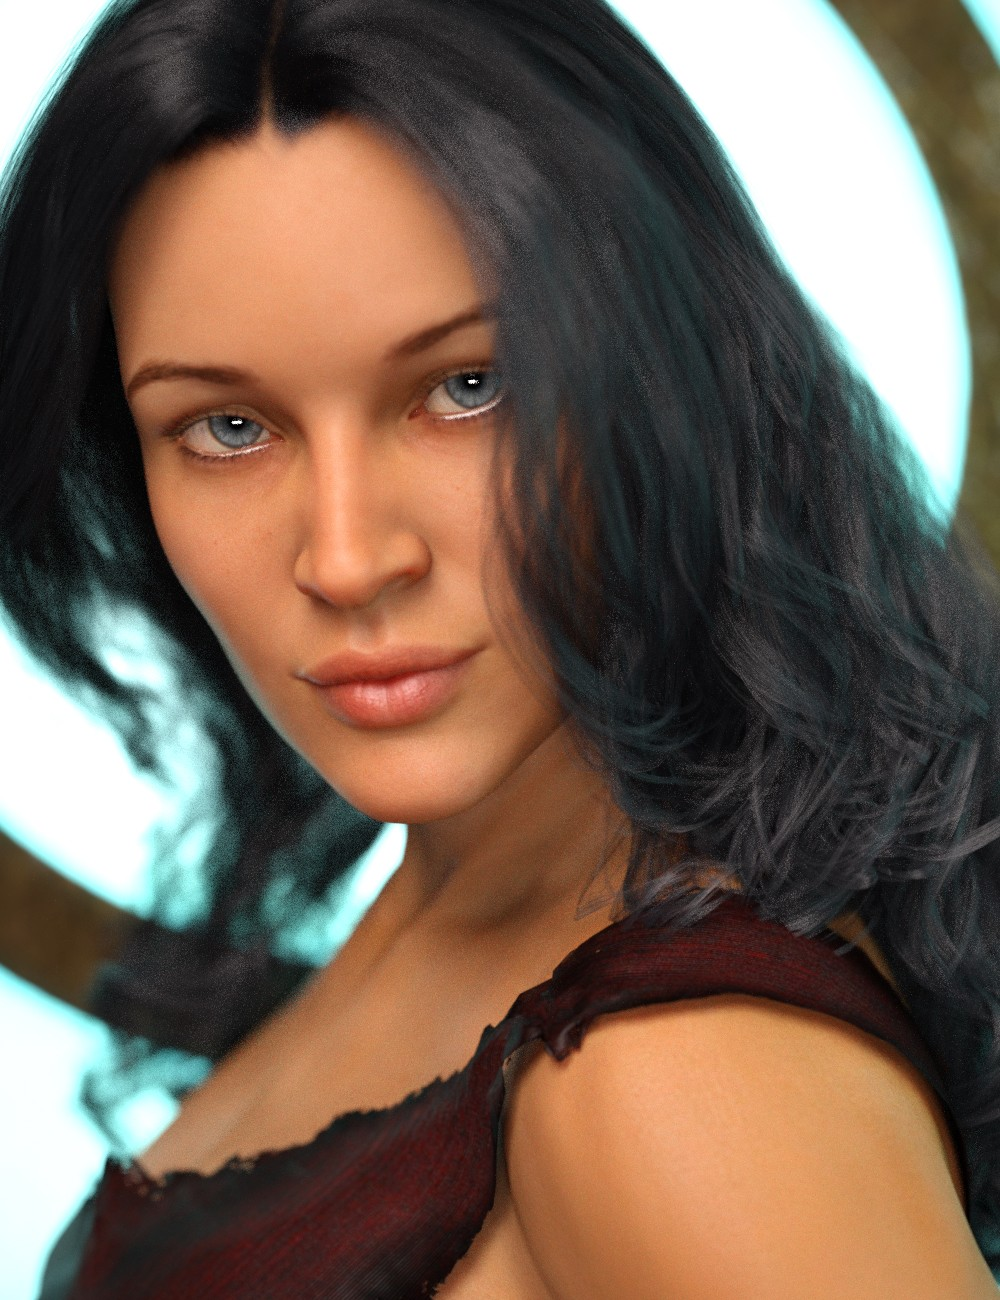 Poser and DAZ Studio 3D Models: Character|DAZ Studio and Poser Content